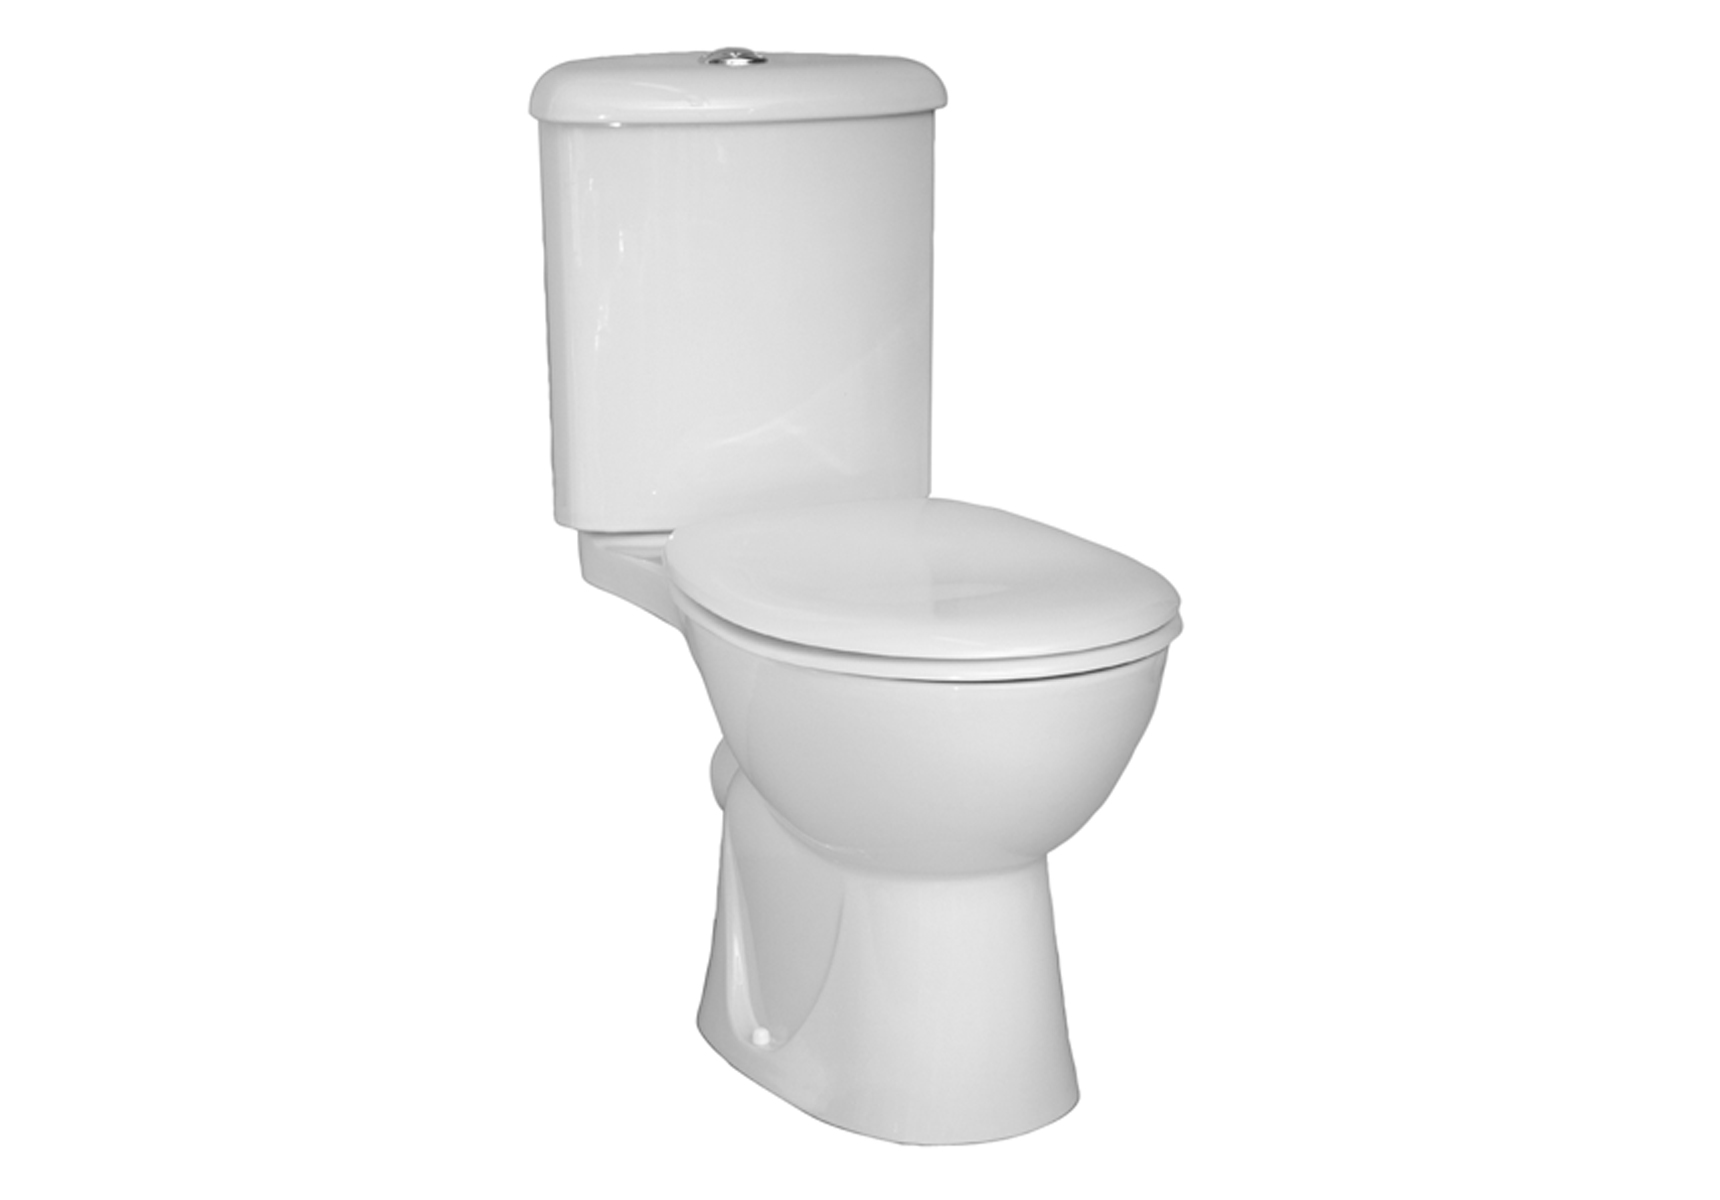 Arkitekt WC suspendu avec bride, 54 cm